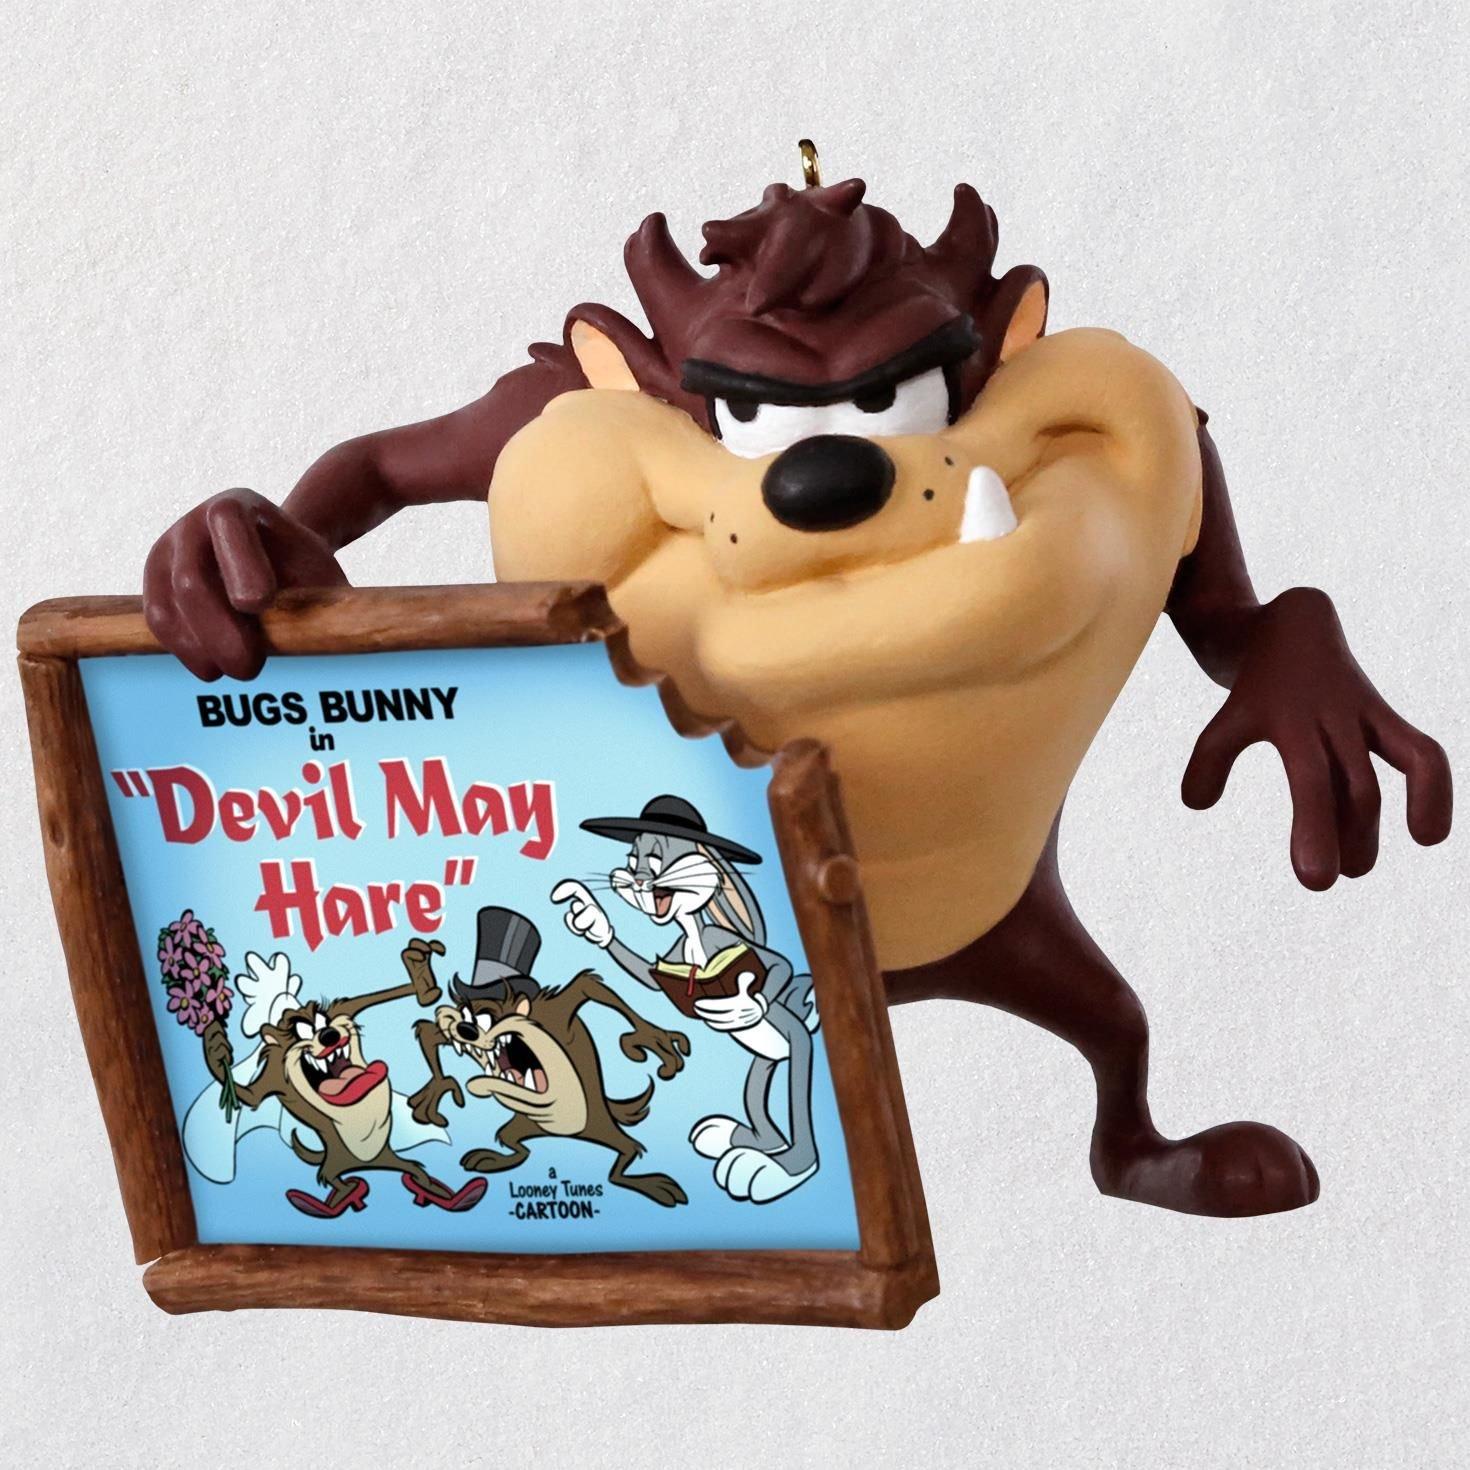 Looney Tunes Taz''Devil May Hare'' Ornament keepsake-ornaments Movies & TV